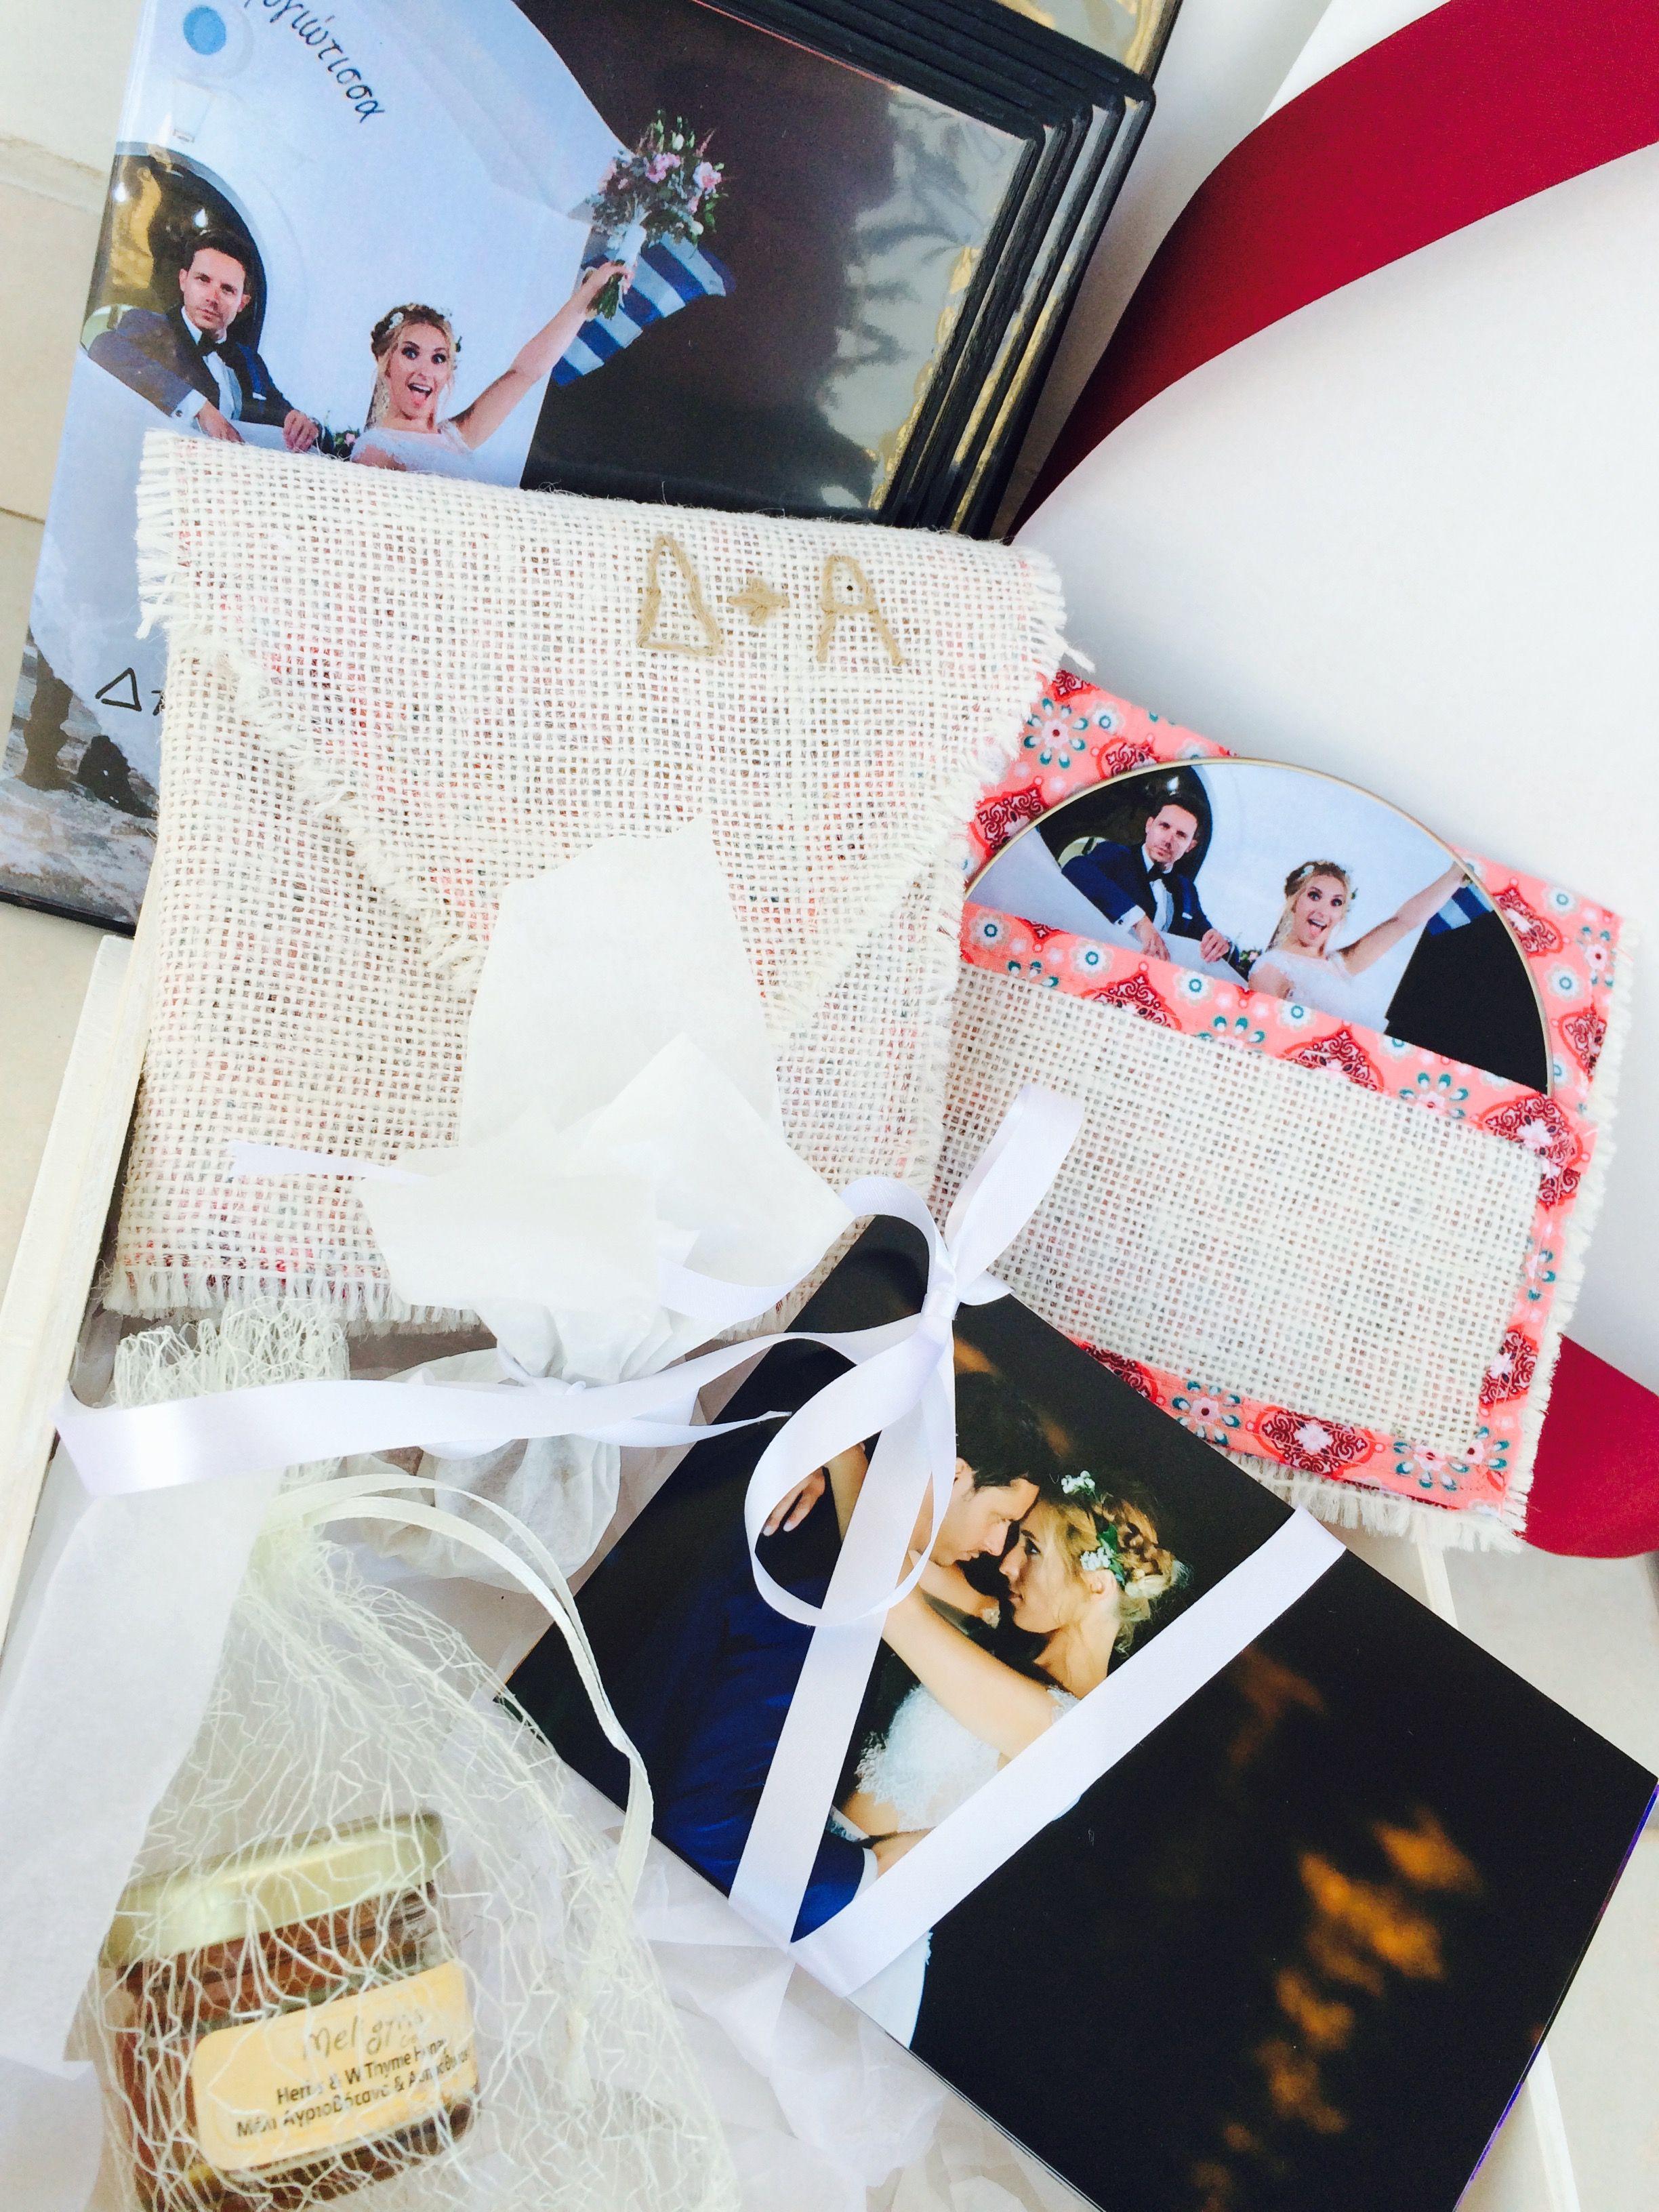 #Handmade #giftcase for #DimitrisMakalias & #AntigoniPsichrami #weddingvideo !!  Thank you for trusting us with the best day of your life!! Cinematography hsweddings.gr  Photography Nikos Karanikolas (Locotoro Design & Photography)   #weddingideas #weddingcinematography #weddingvideo #weddingvideocase #handmadecase #handmadedvdcase #homemade #homemadedvdcase #dvdcase #weddinginspiration #weddingift #madeby @hsweddingsgr  https://instagram.com/p/BRFqNc7FNZs/